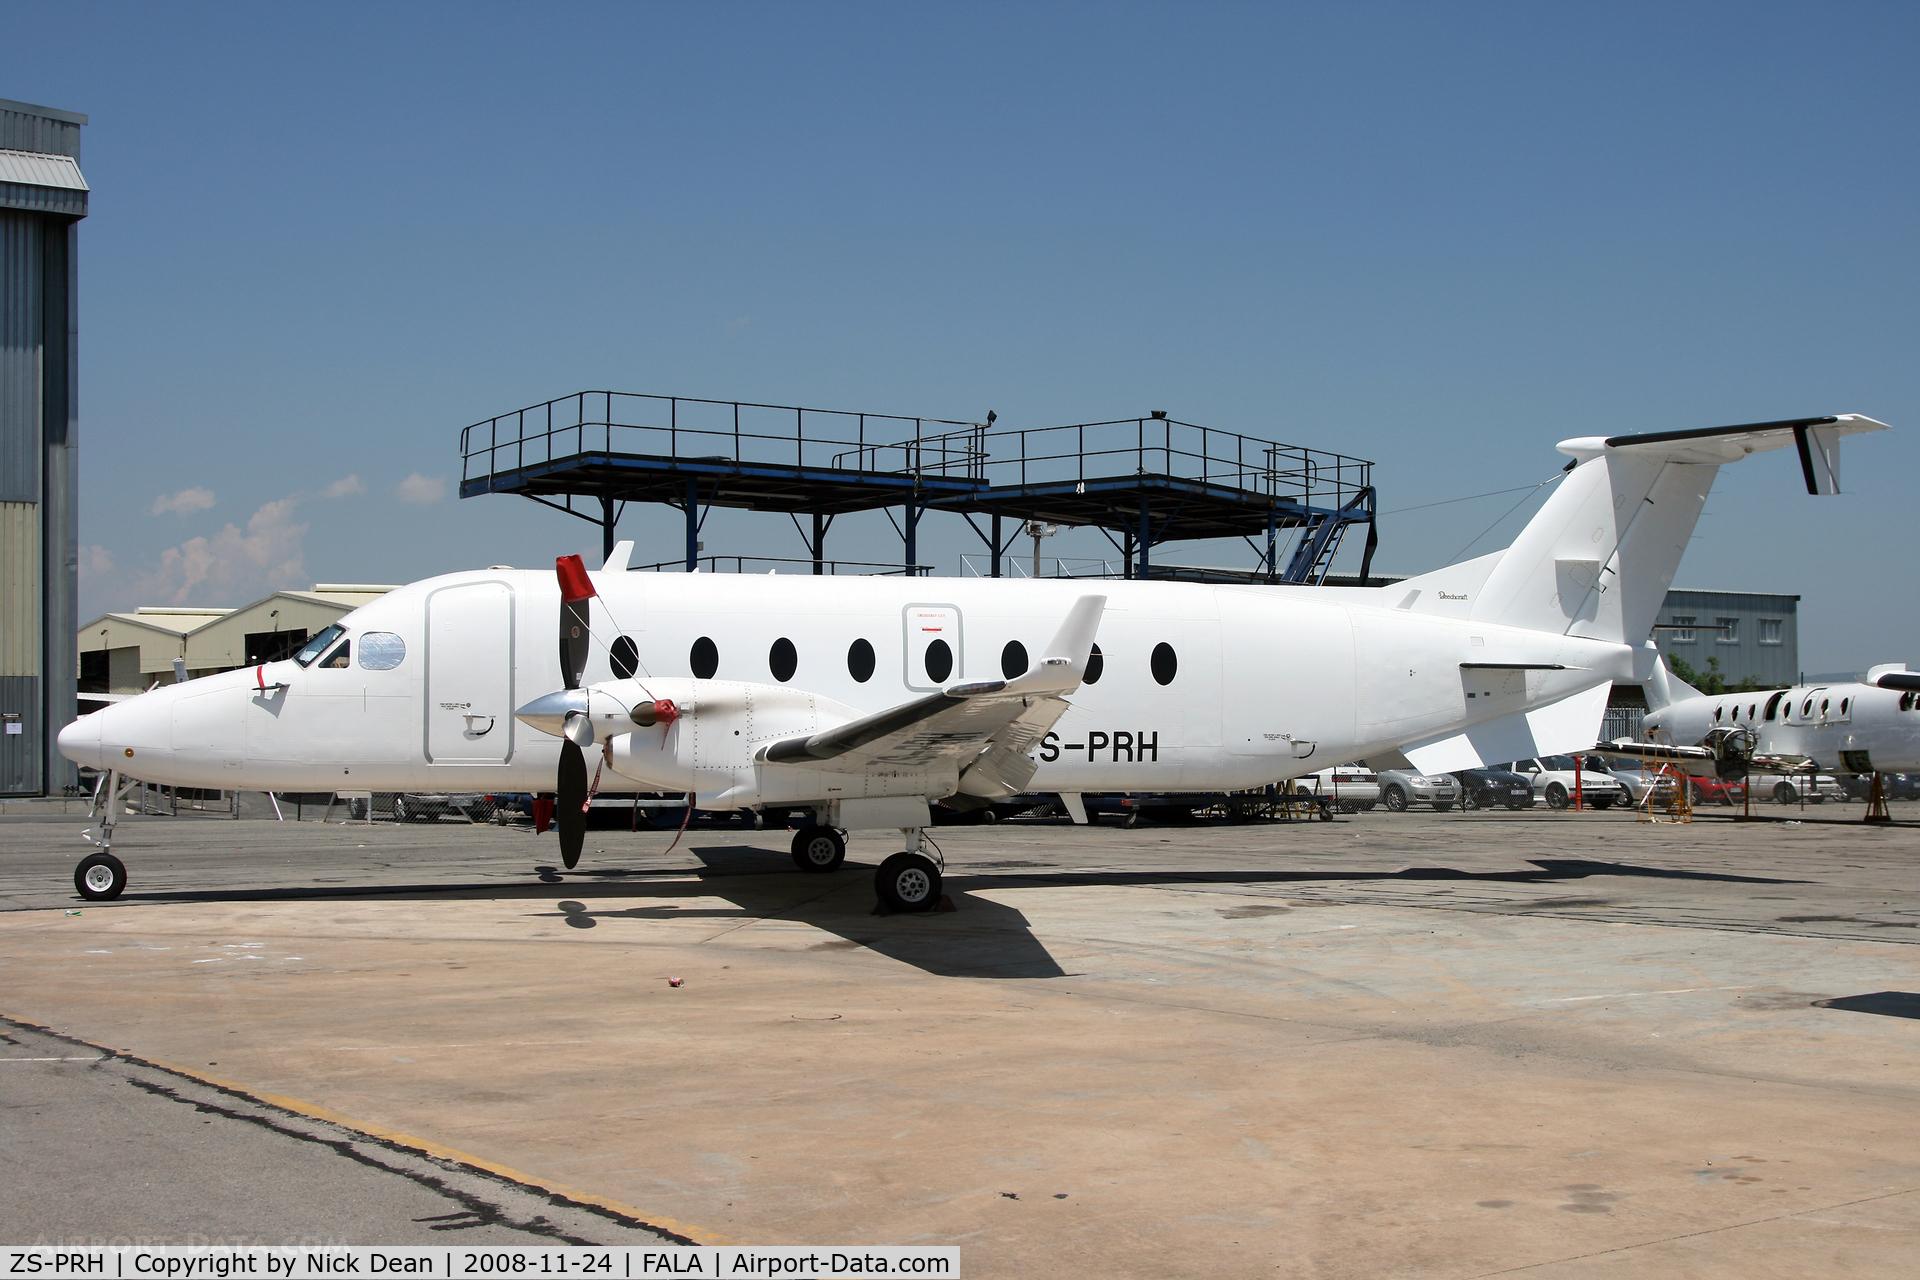 ZS-PRH, 1998 Beechcraft 1900D C/N UE-316, FALA